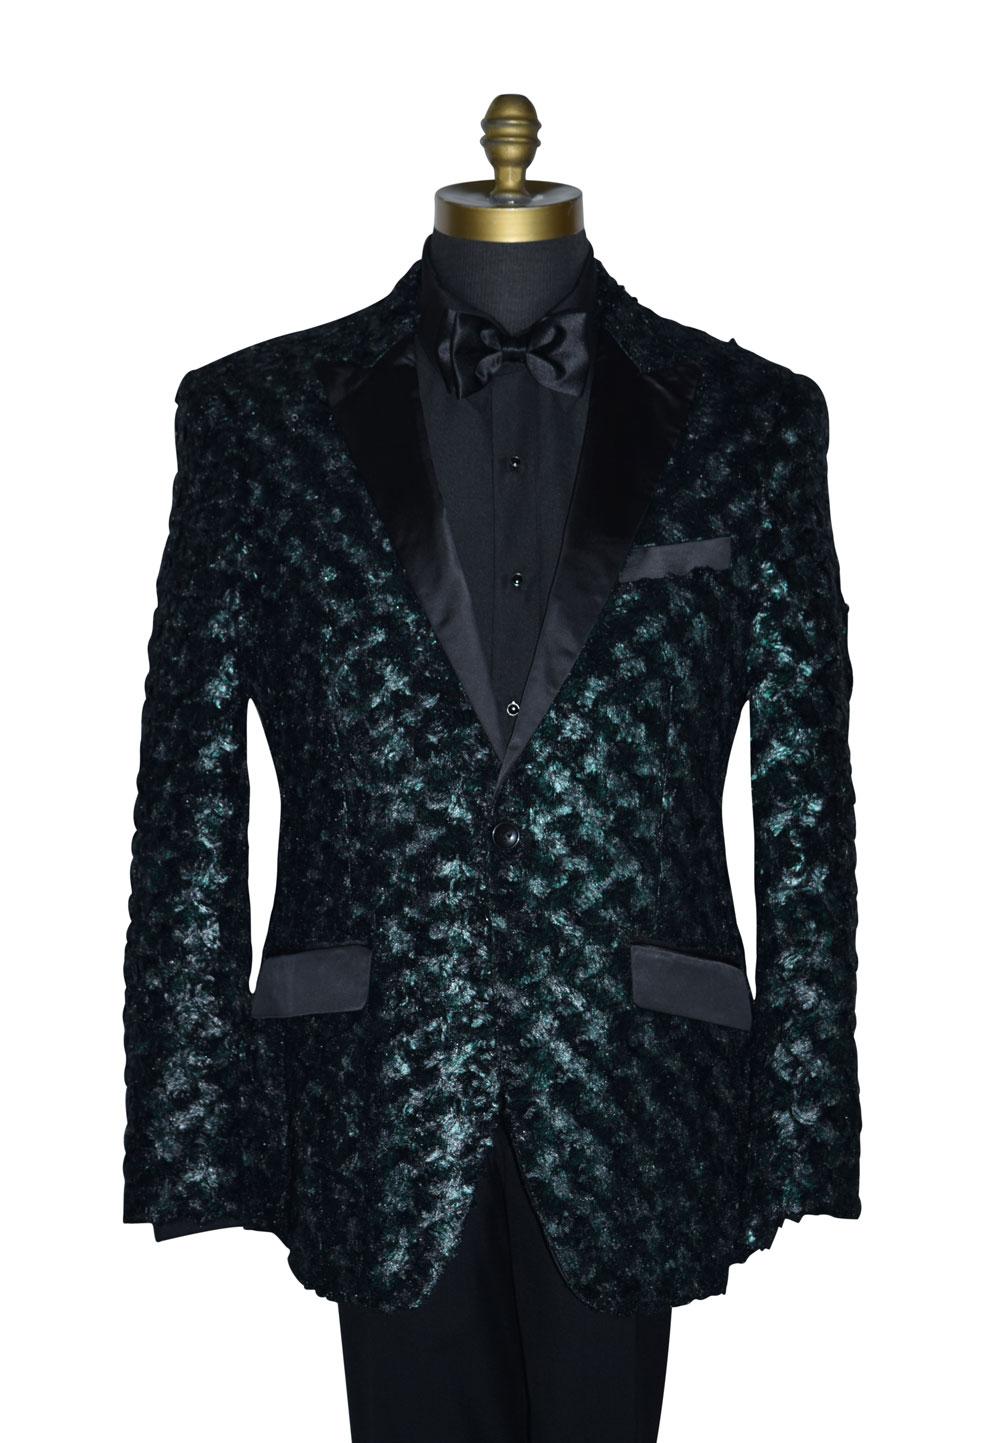 Green Onyx Tuxedo Only